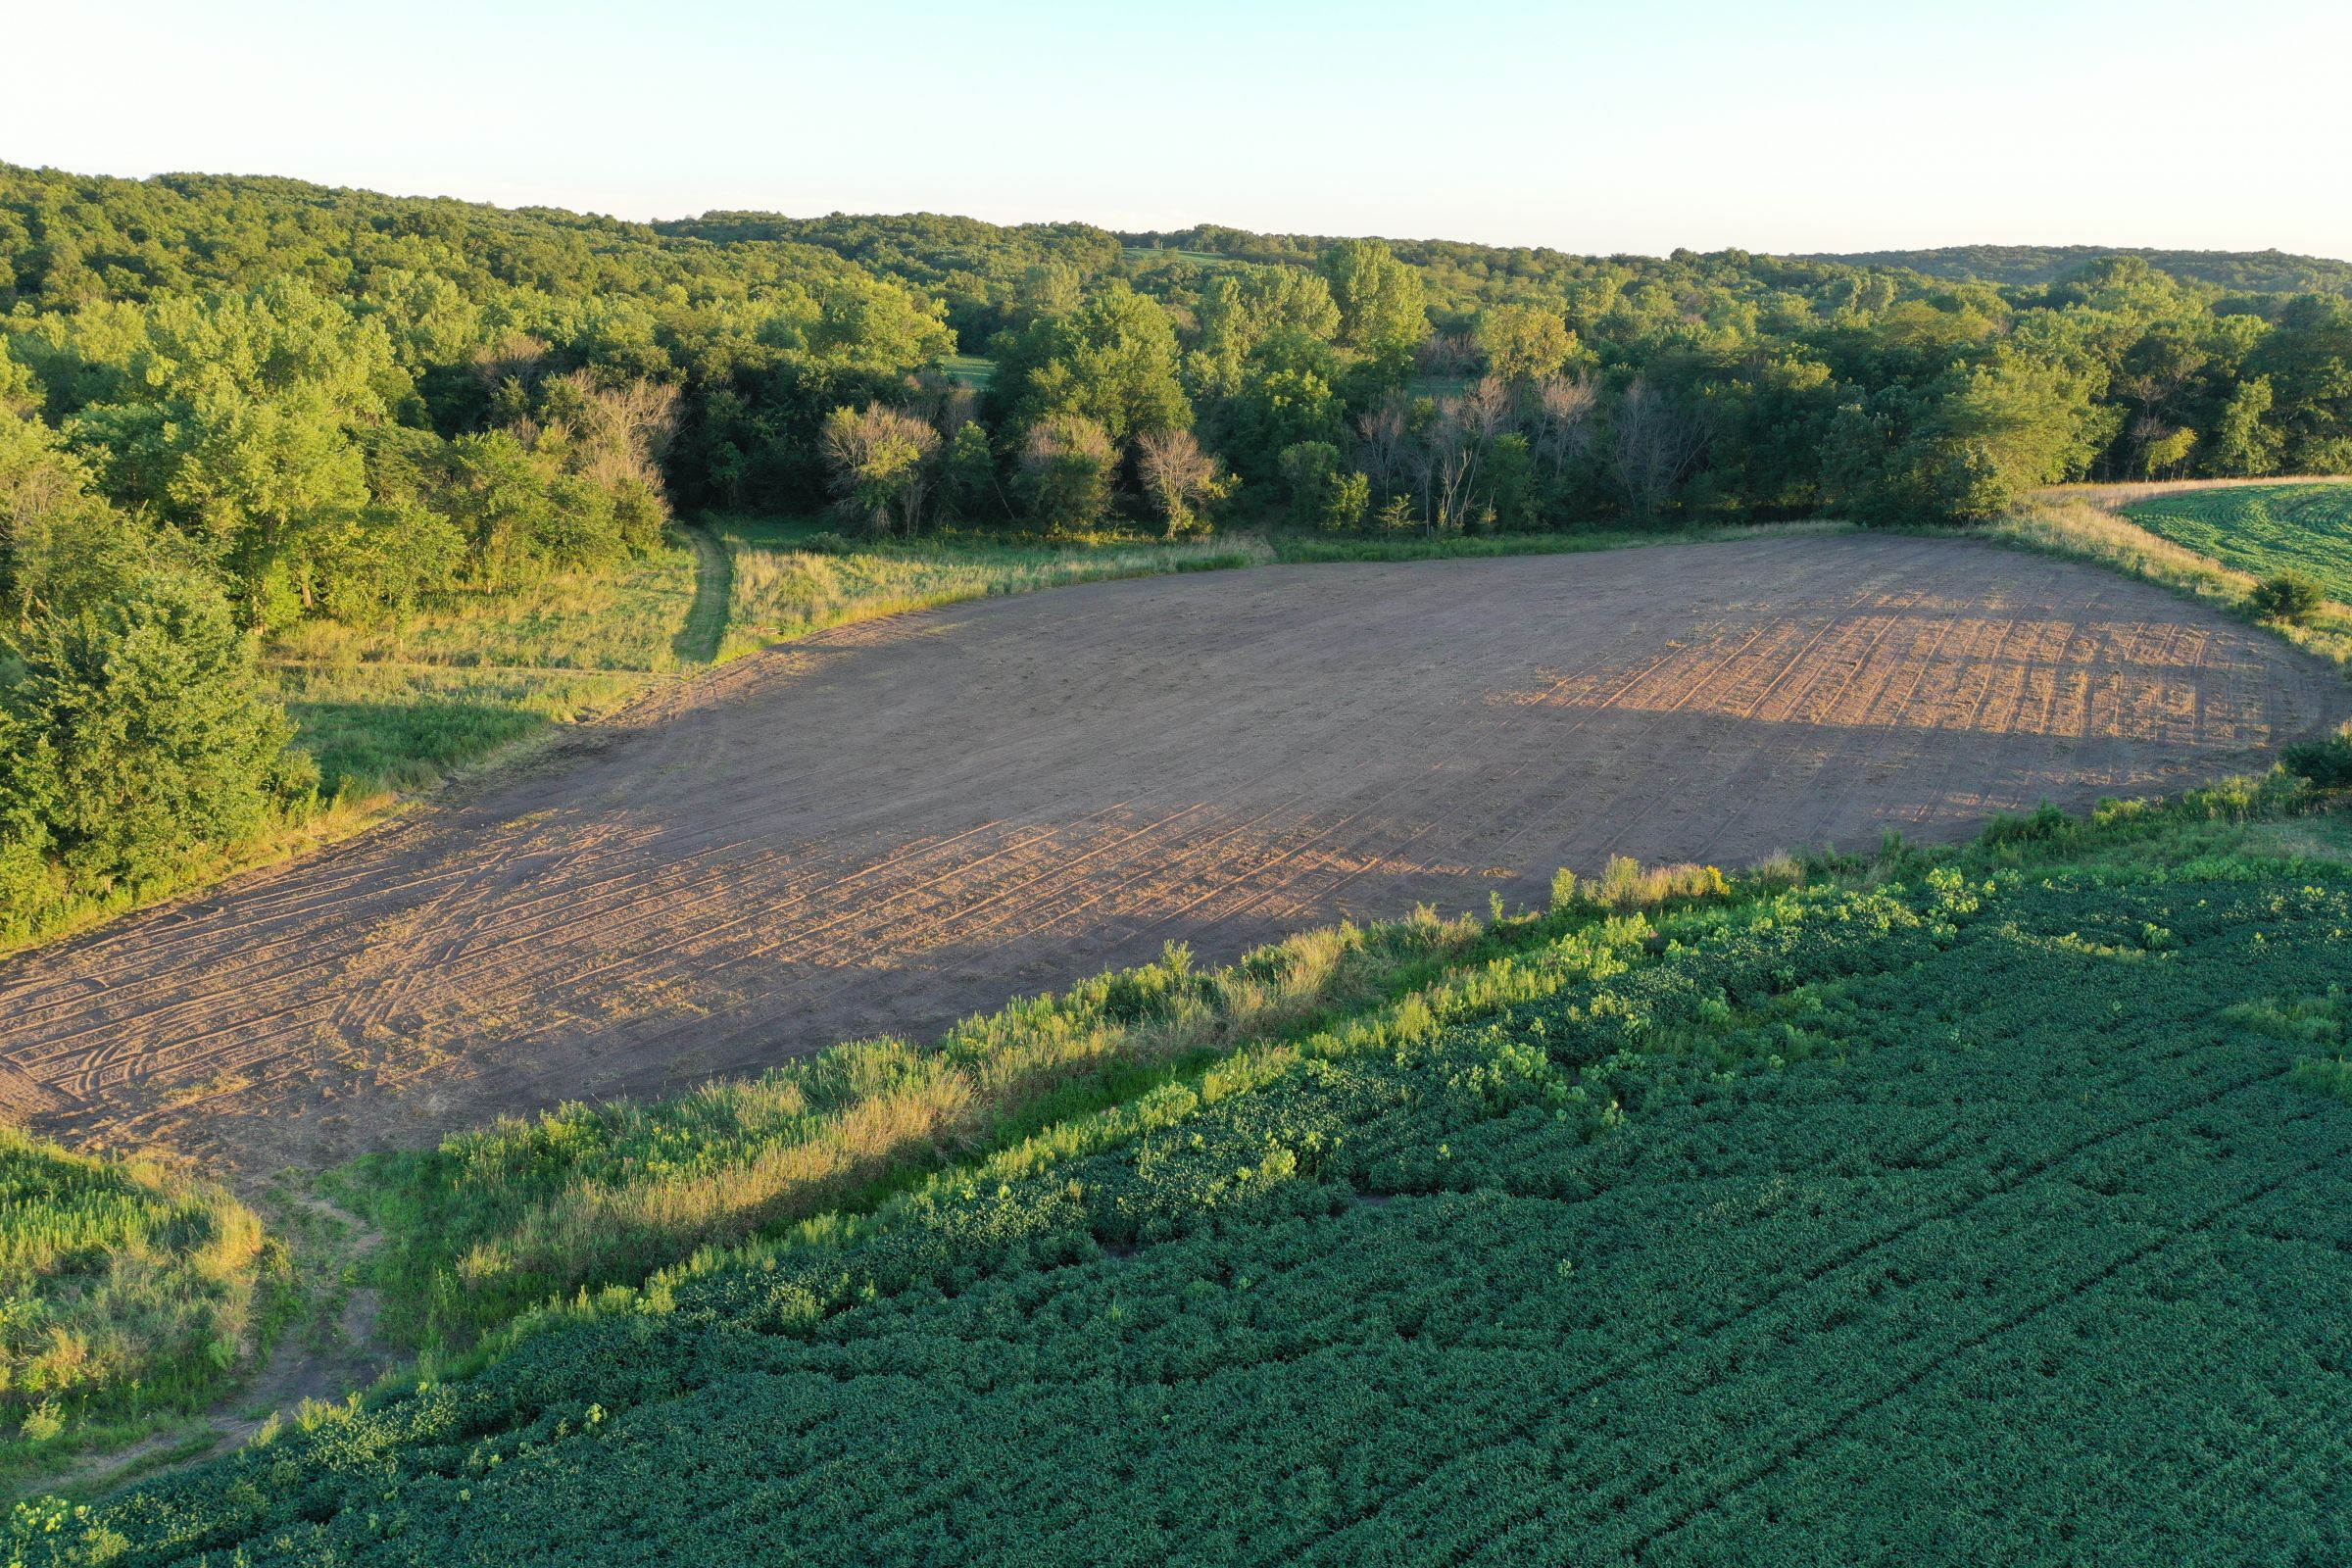 land-clarke-county-iowa-325-acres-listing-number-15416-5-2021-03-18-162757.JPG